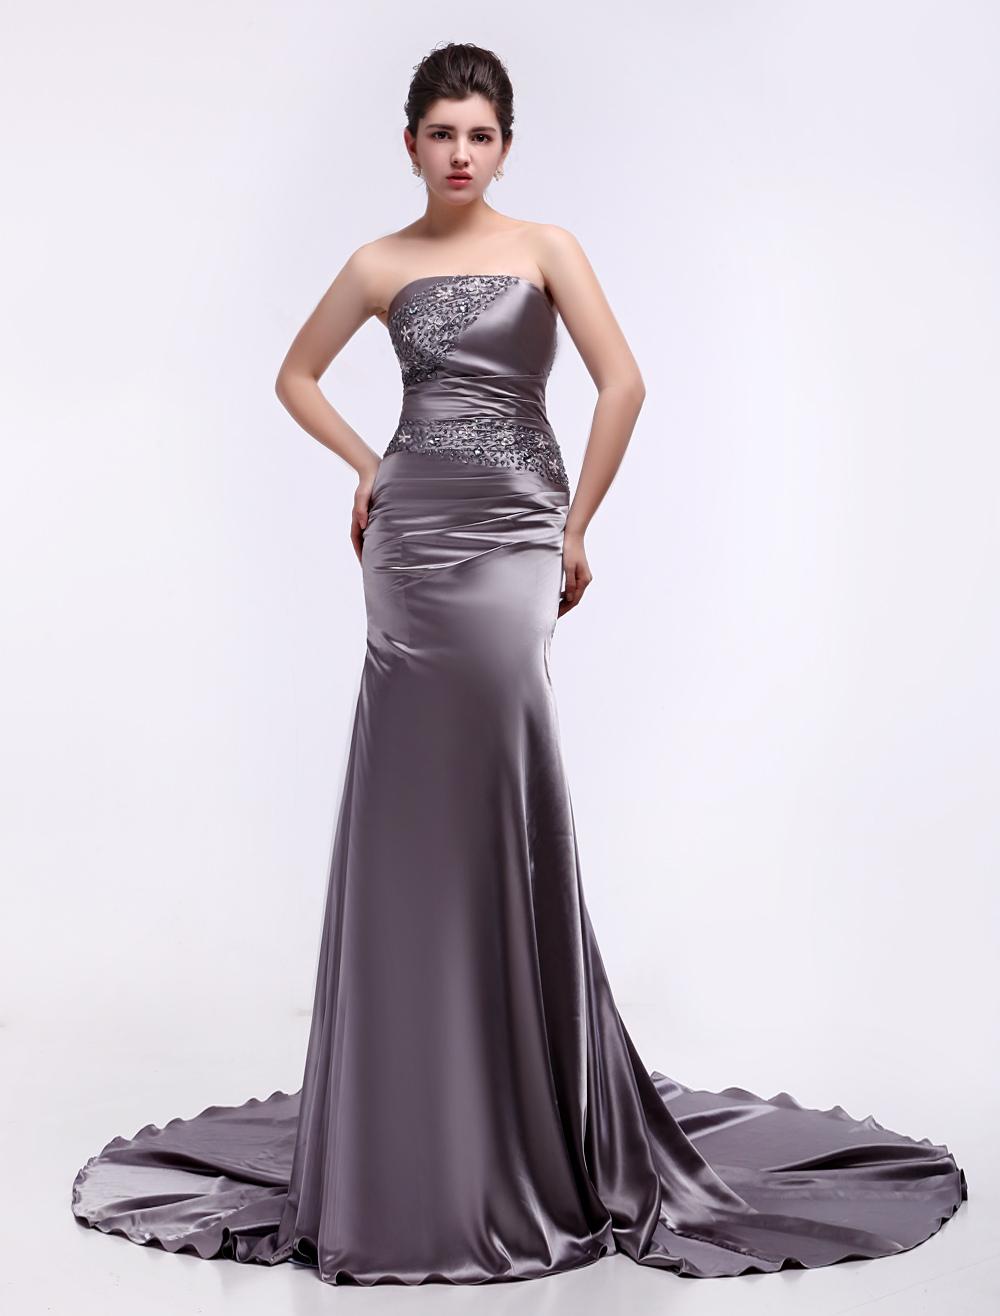 Elastic Woven Evening Dress (Wedding Evening Dresses) photo